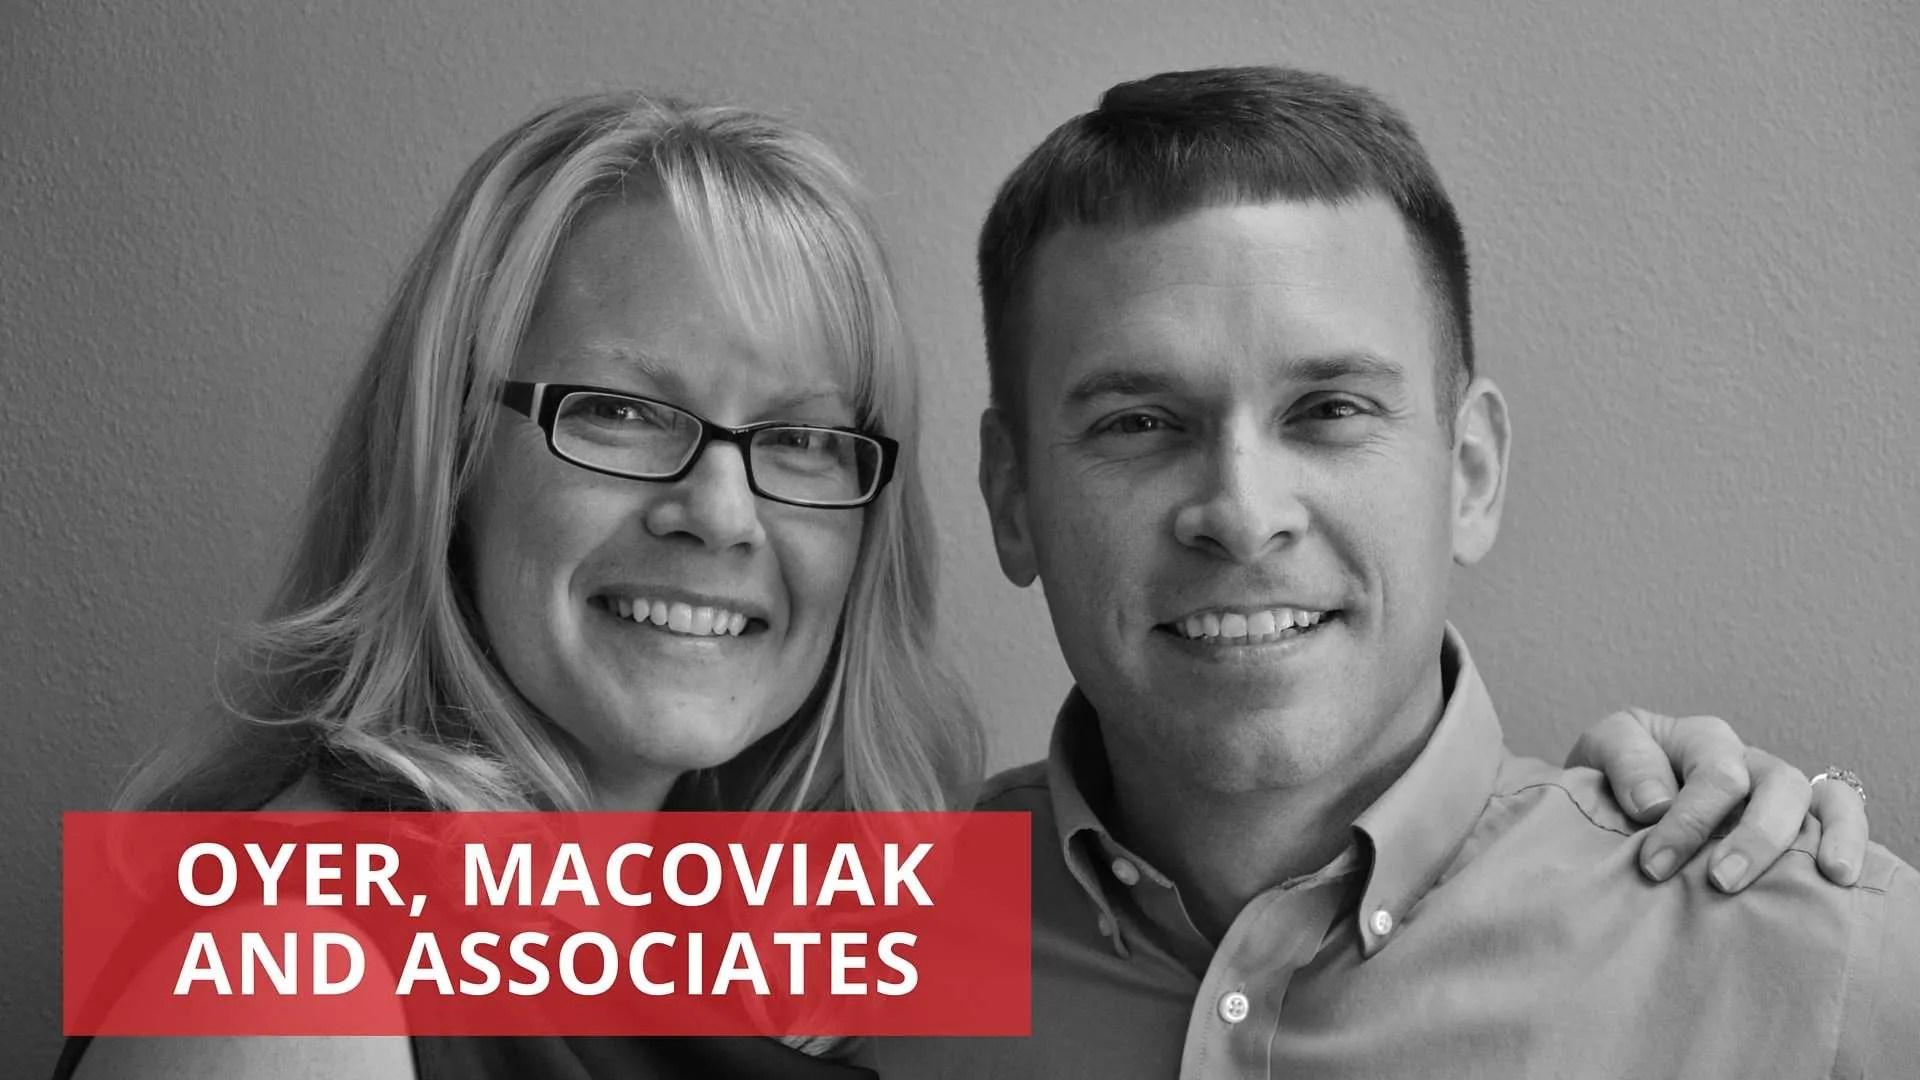 Oyer, Macoviak and Associates